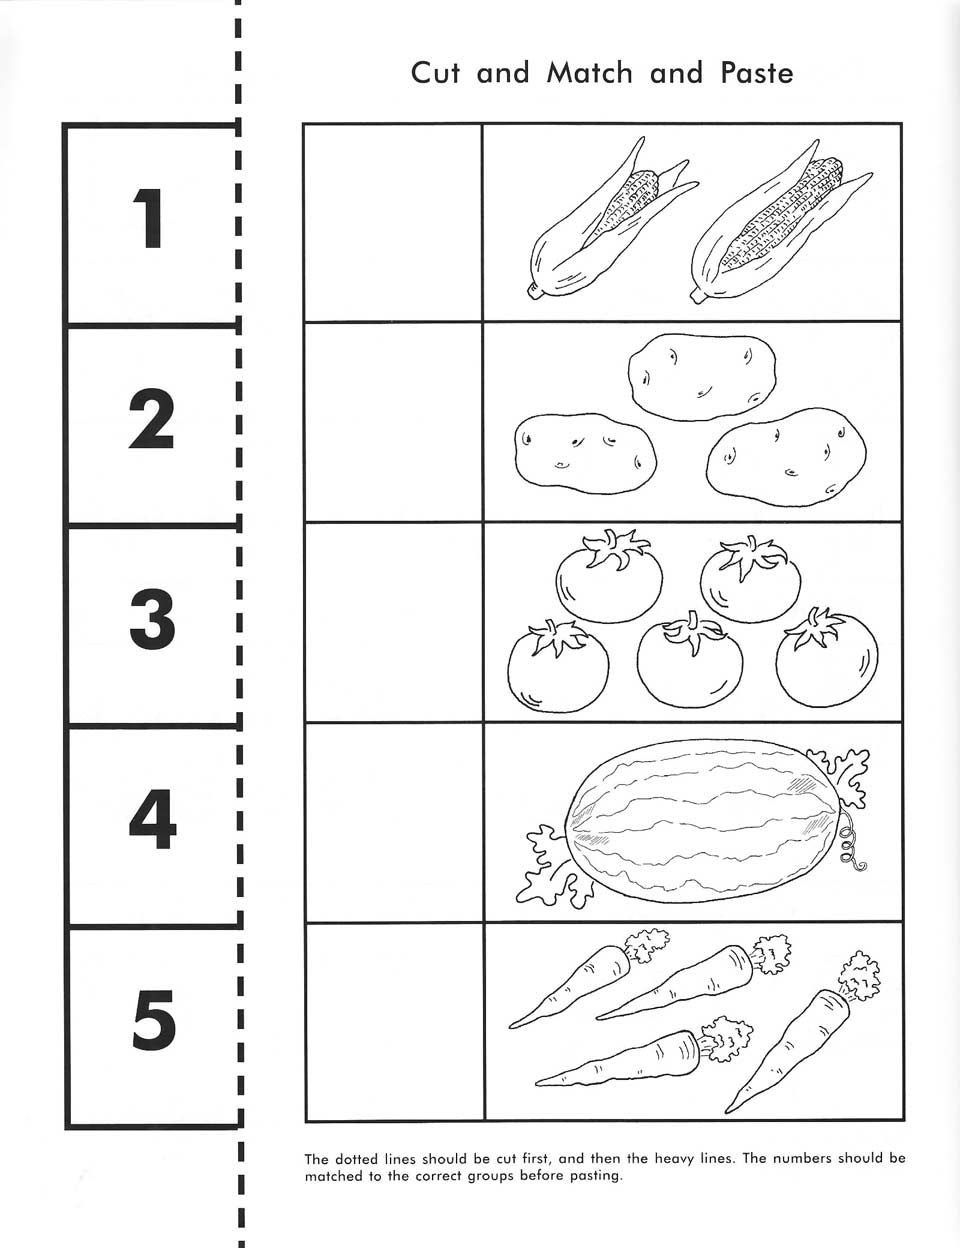 Pre Kindergarten Worksheets Numbers Worksheet For Kindergarten Kindergarten Worksheets Printable Kindergarten Math Worksheets Preschool Workbooks Free cut and paste addition